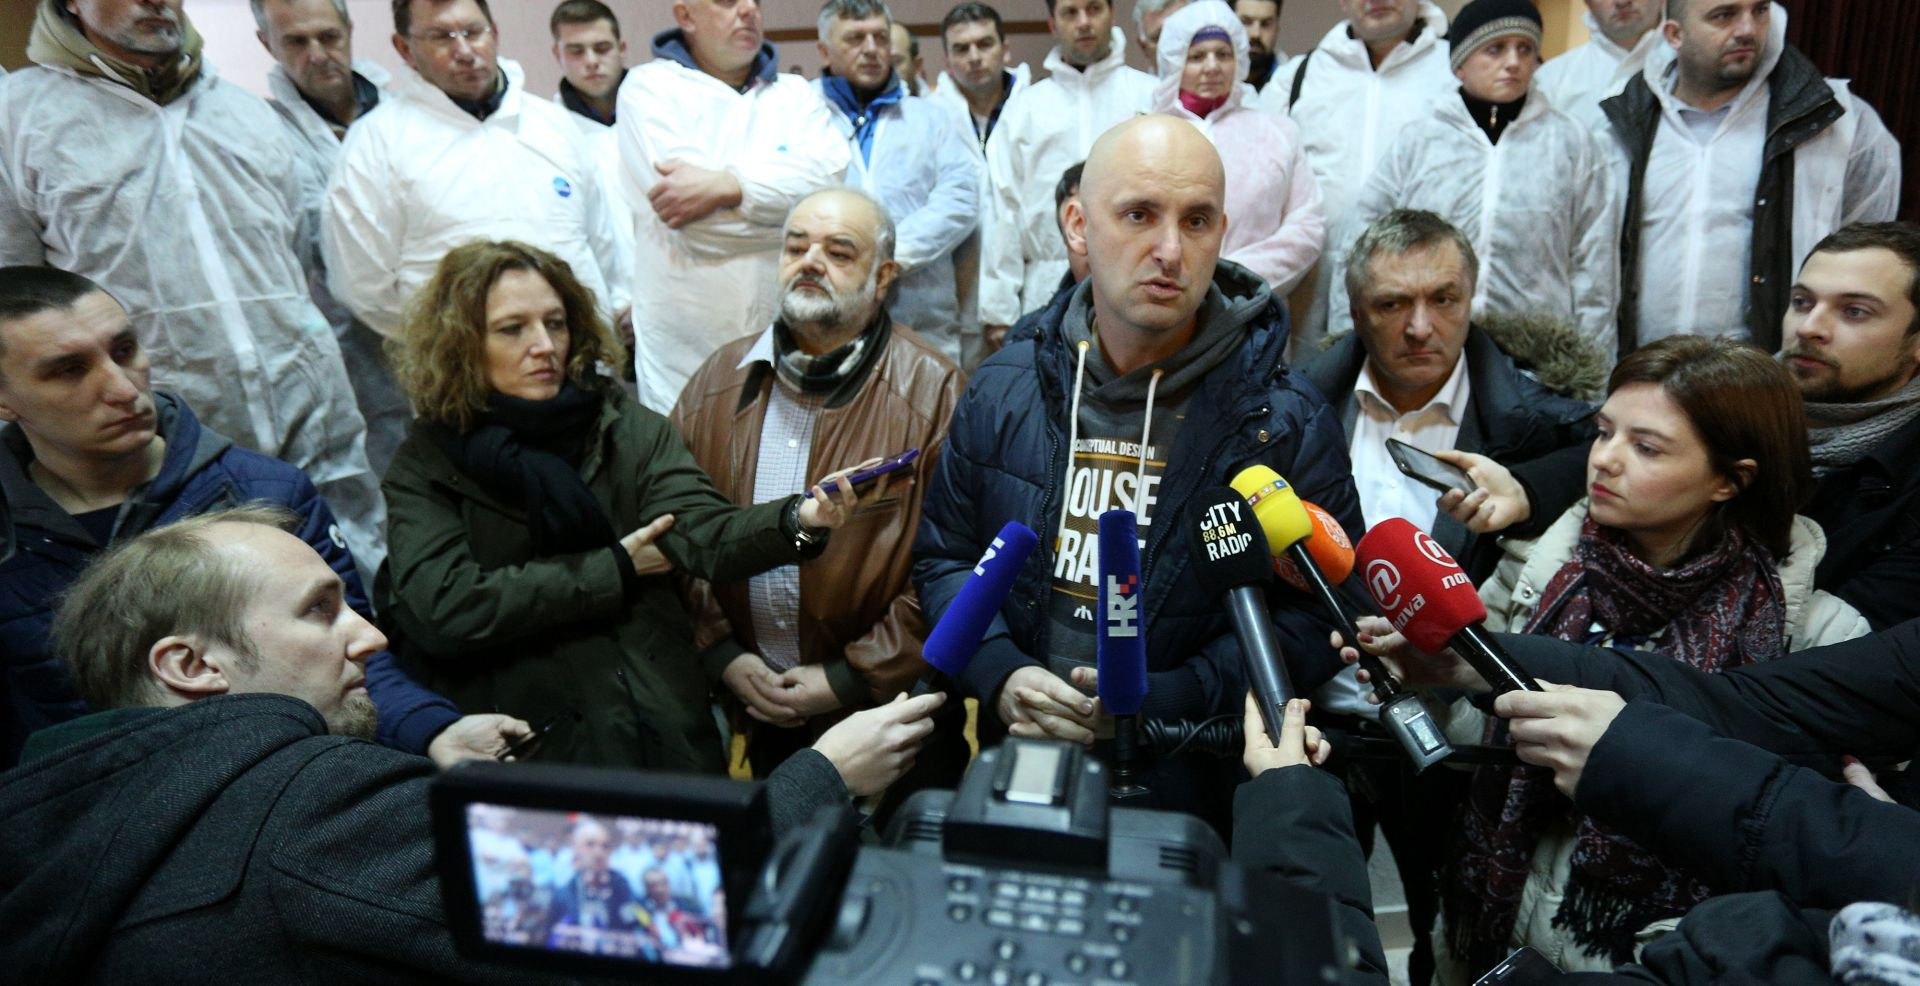 MINISTARSTVO POLJPRIVREDE Završena eutanazija peradi u Sopu Bukevskom